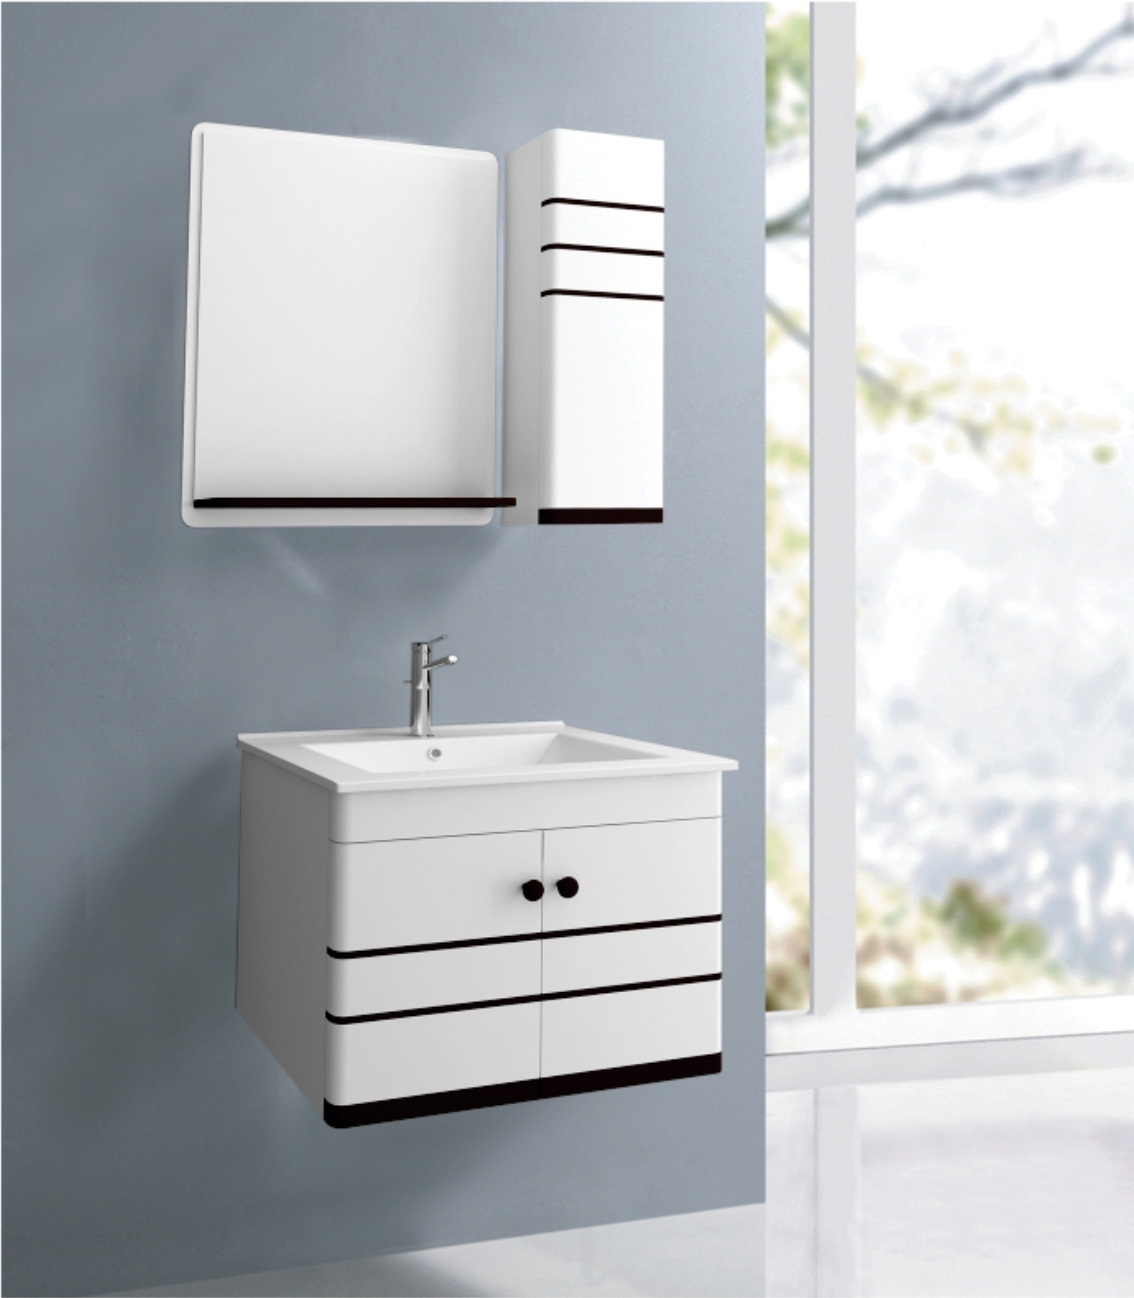 bo-tu-lavabo-kassani-ks-6002